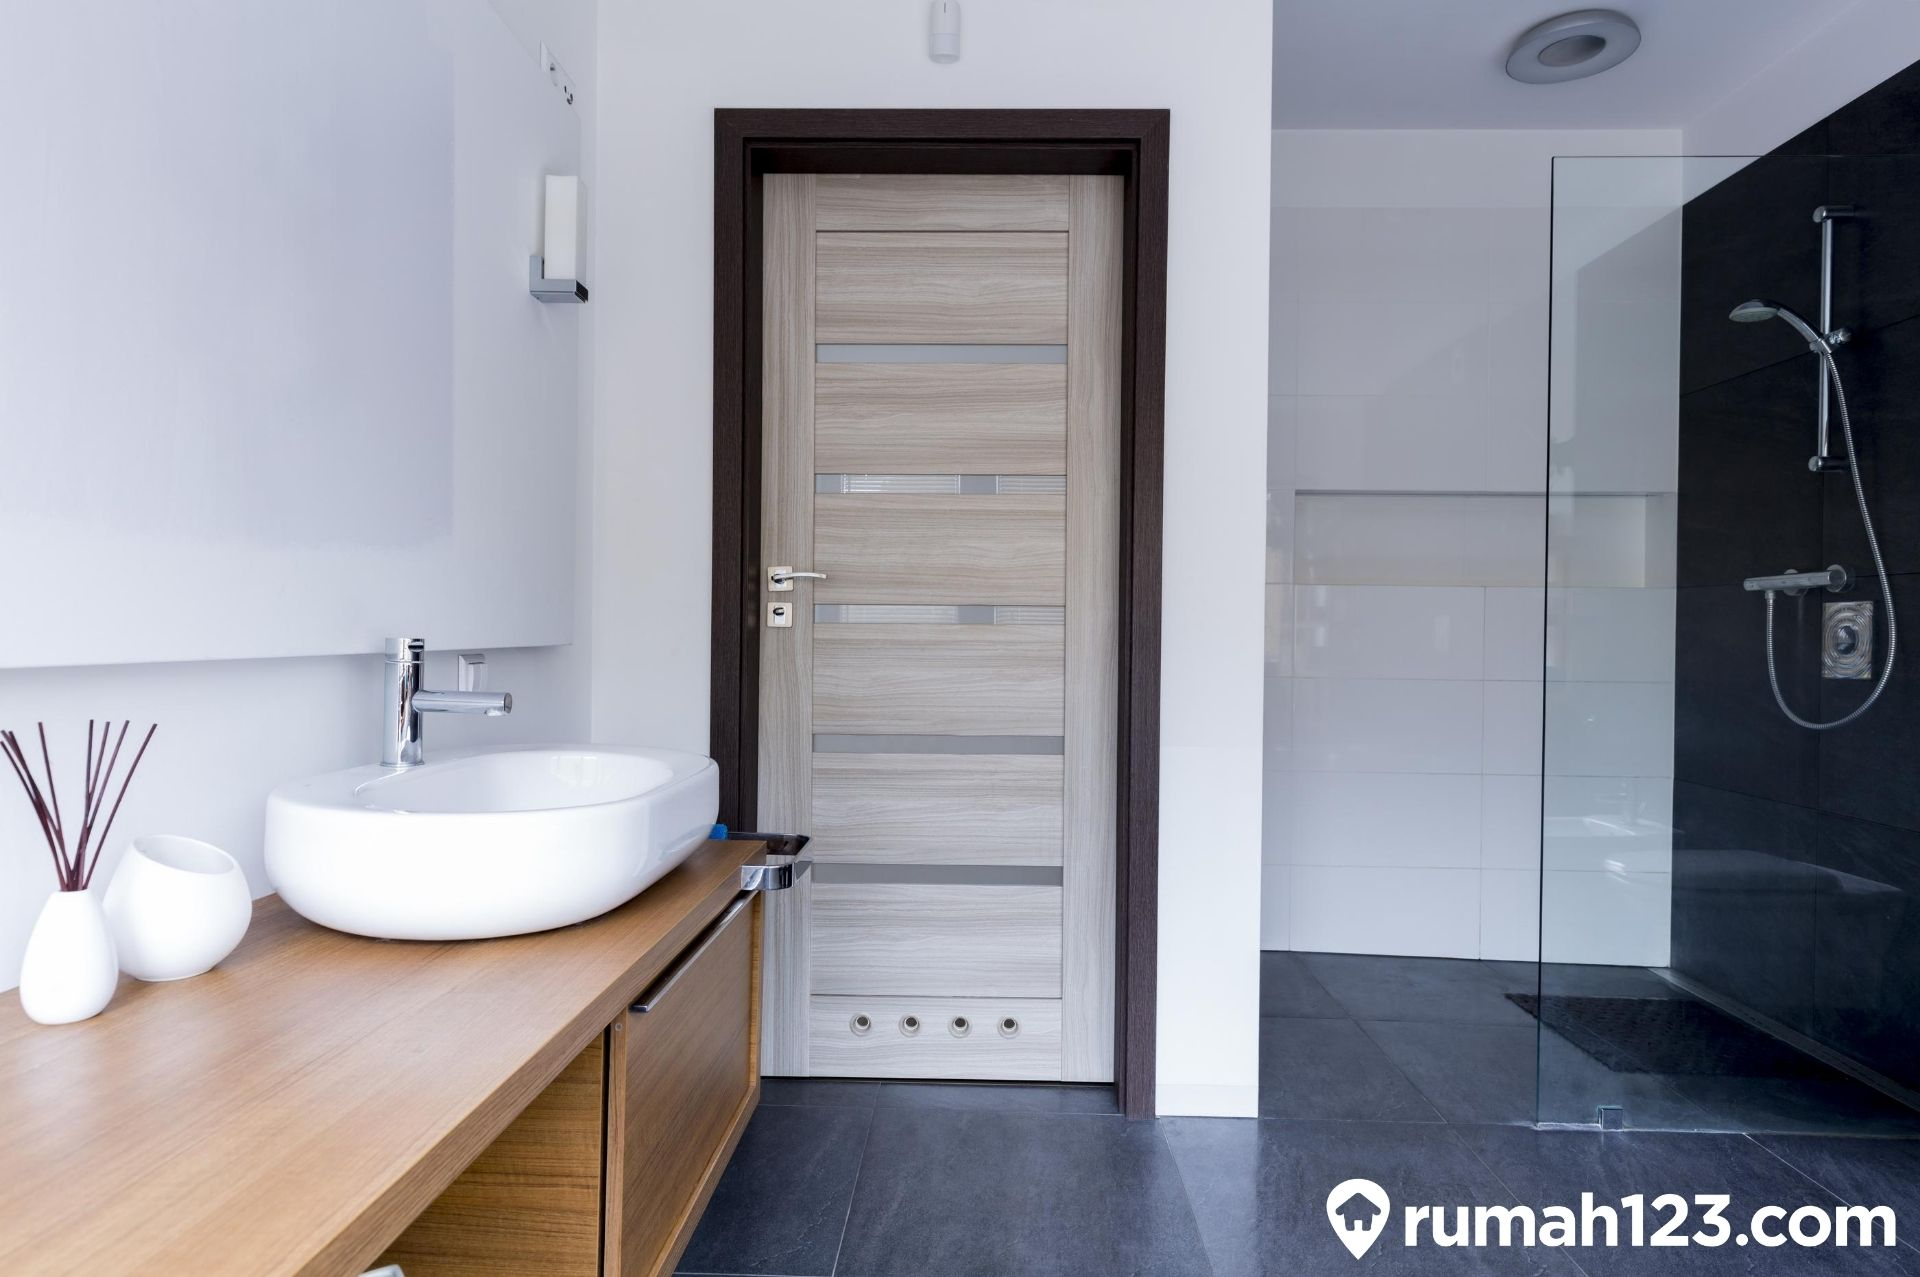 Daftar Harga Wastafel Minimalis Terbaru Bikin Kamar Mandi Kelihatan Modern Rumah123 Com